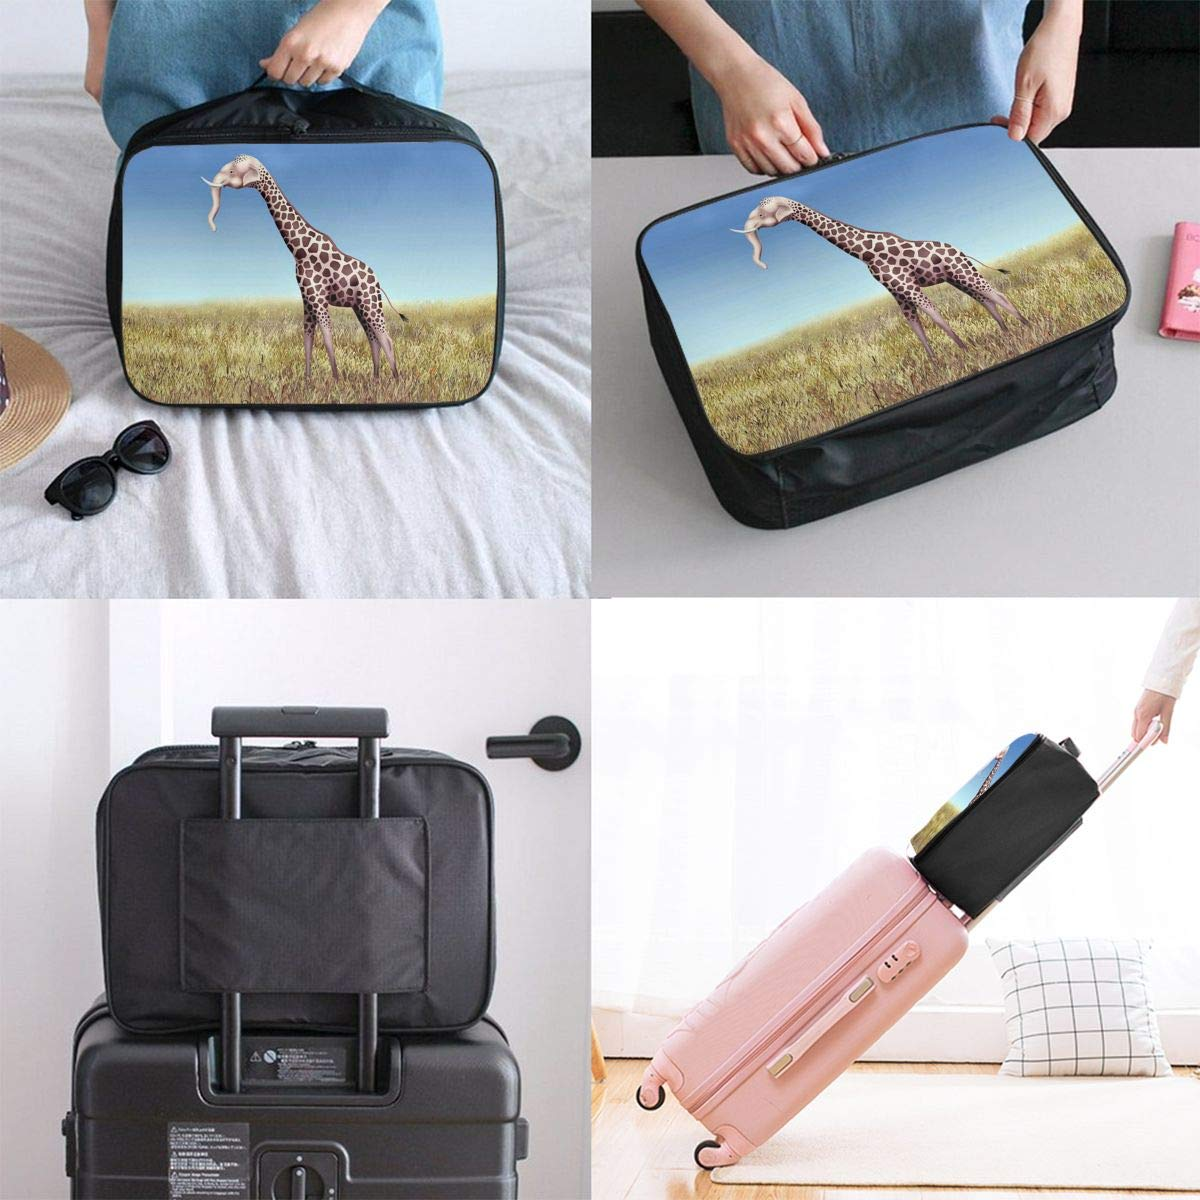 Travel Luggage Duffle Bag Lightweight Portable Handbag Funny Elephant Giraffe Print Large Capacity Waterproof Foldable Storage Tote